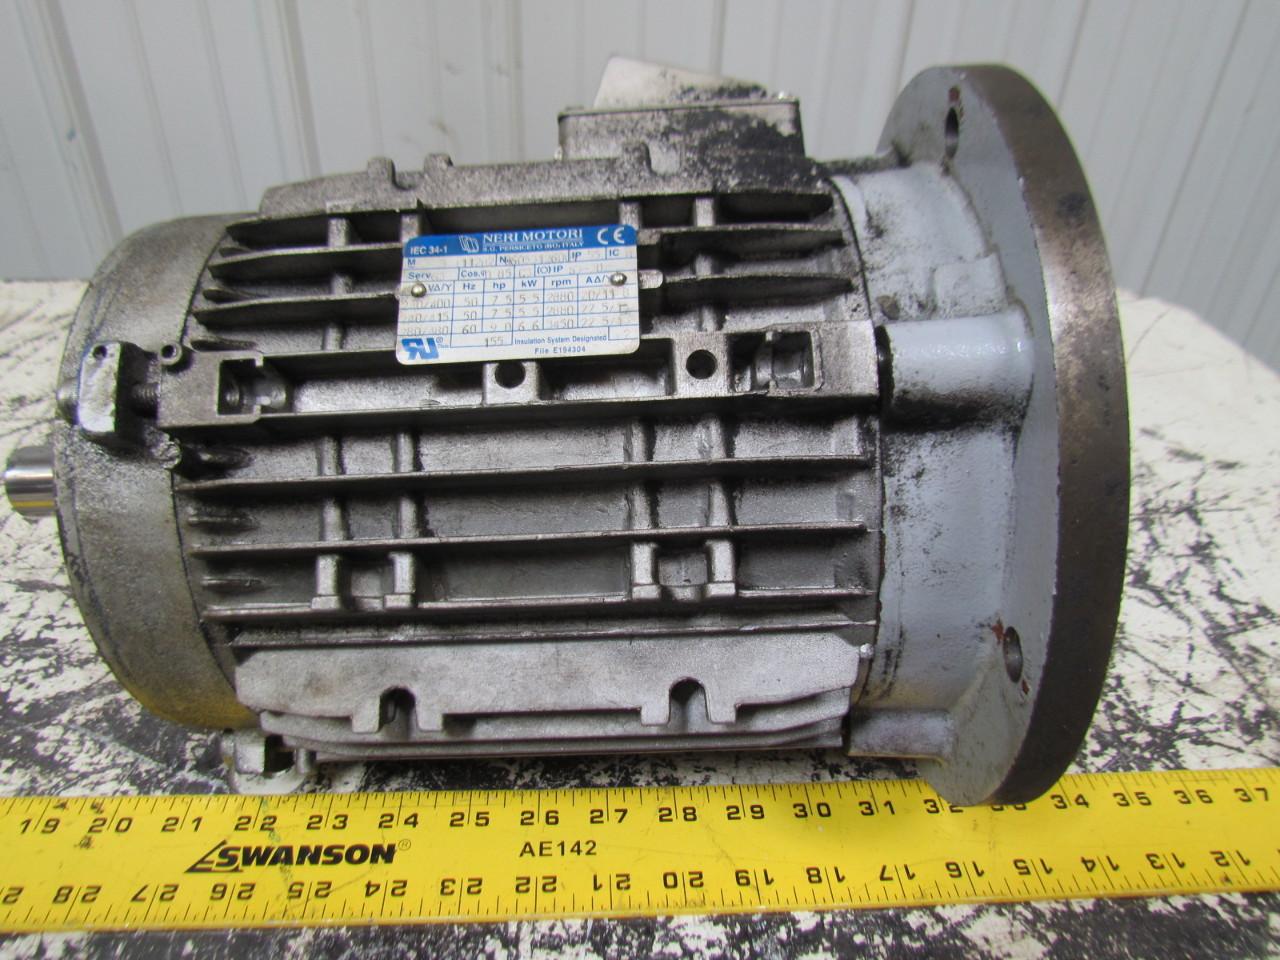 Neri motori 9hp 3450rpm 280 480v 3ph 28mm shaft 34 1 frame for 9 hp electric motor